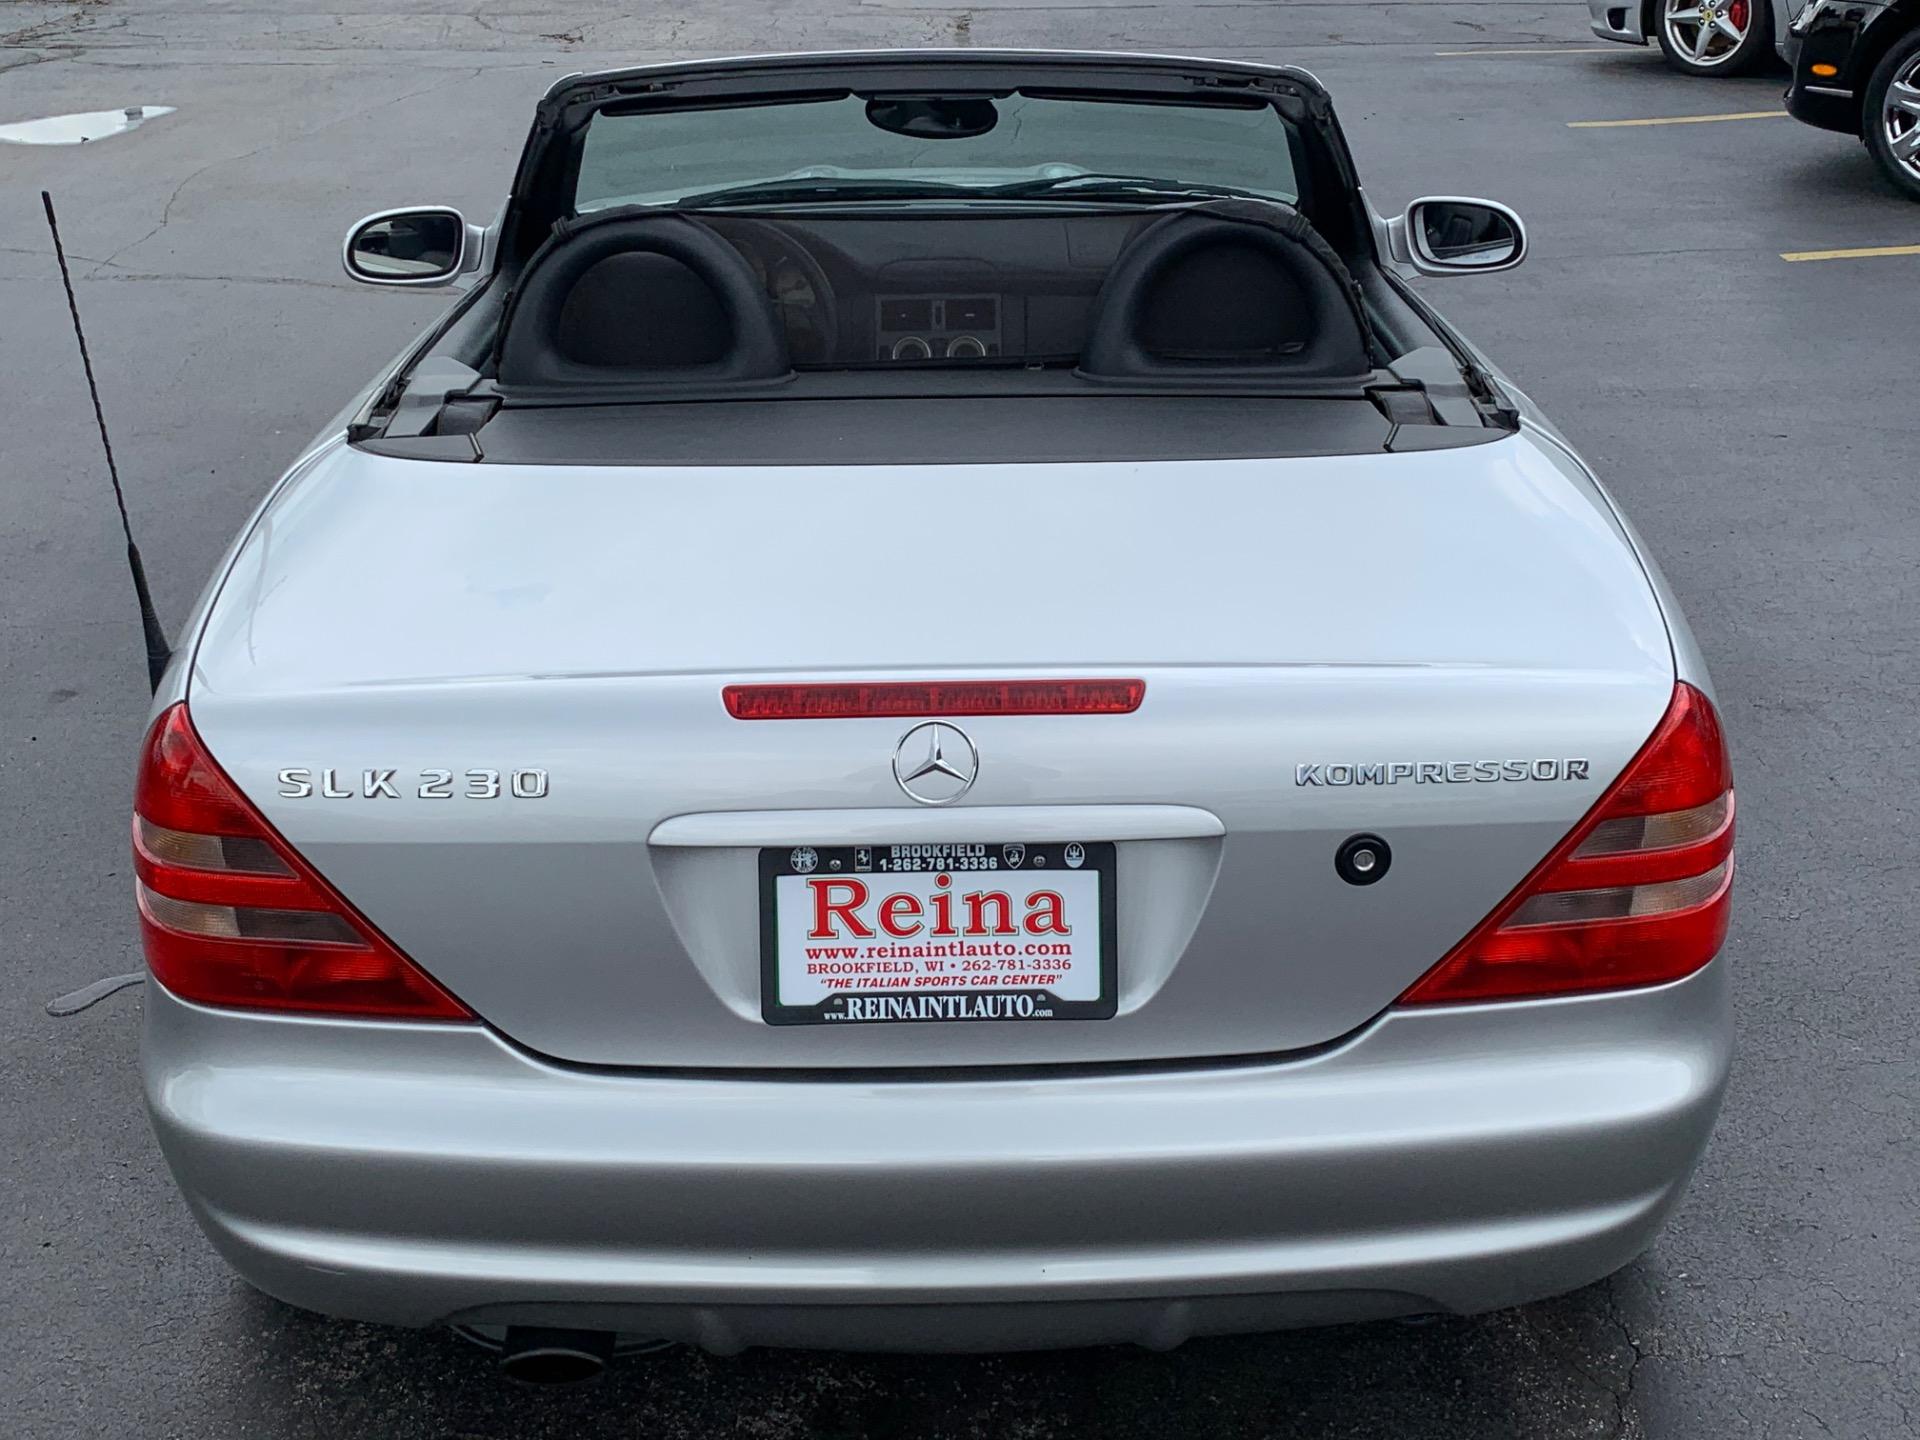 Used-2000-Mercedes-Benz-SLK-230-Convertible